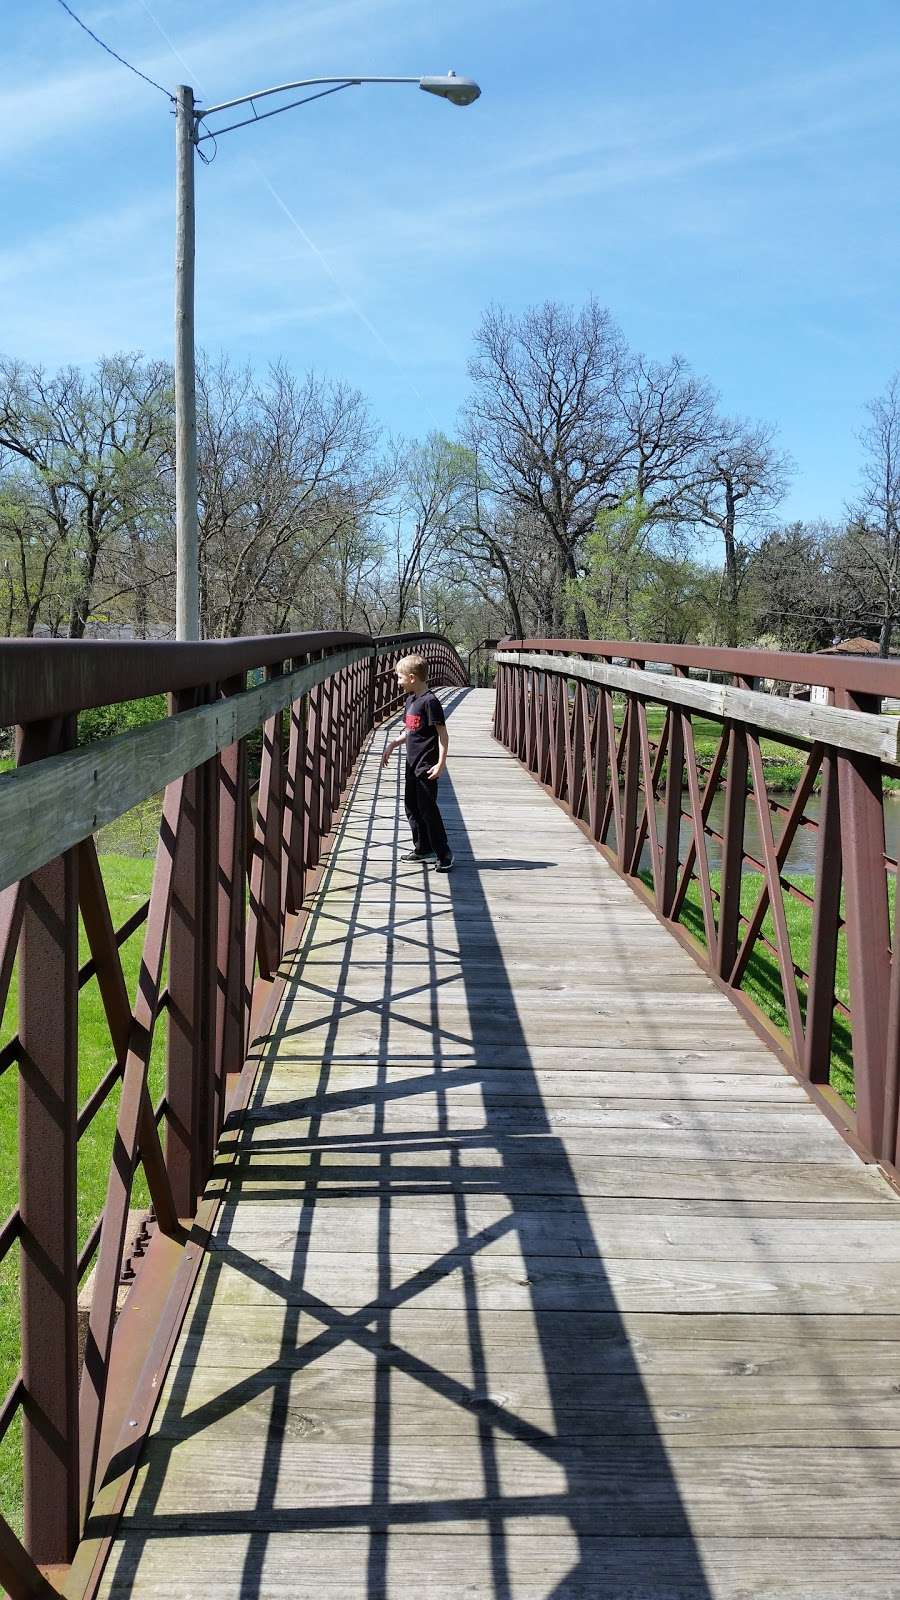 Turtle Hill Park - park  | Photo 7 of 10 | Address: Turtle St, Shorewood, IL 60404, USA